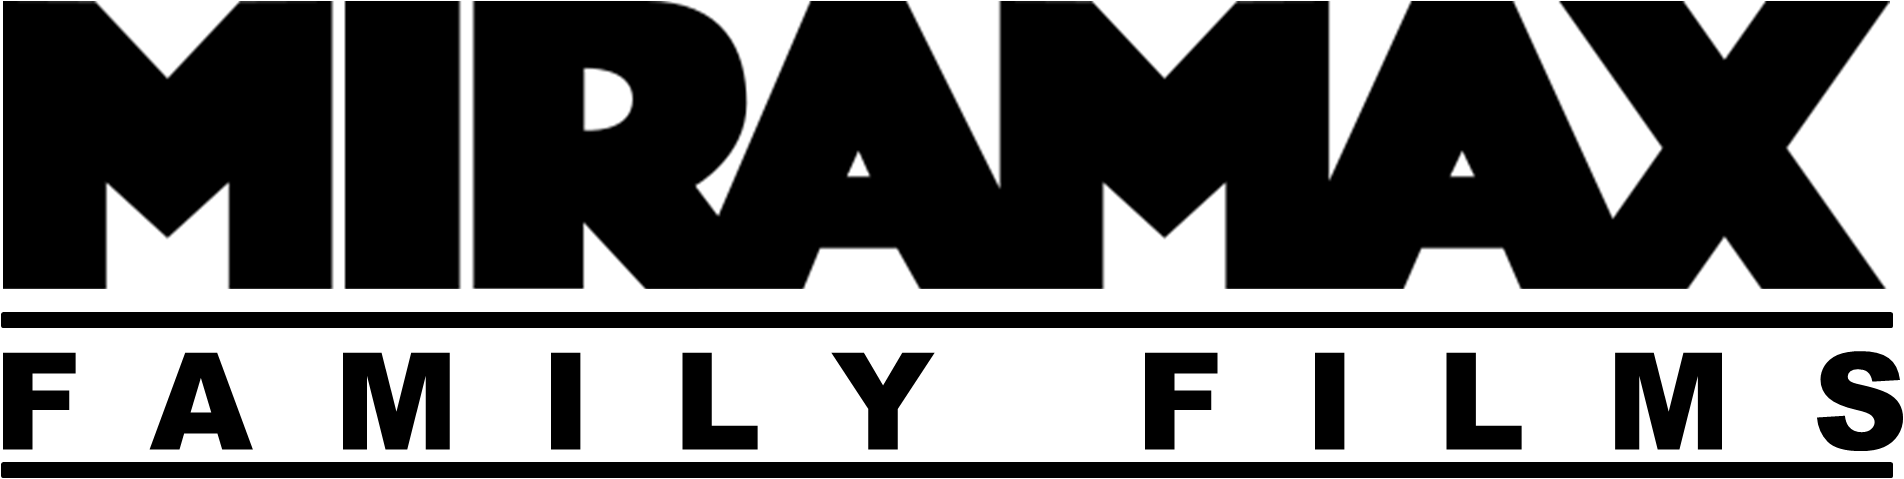 Miramax films logo 1997 cadillac